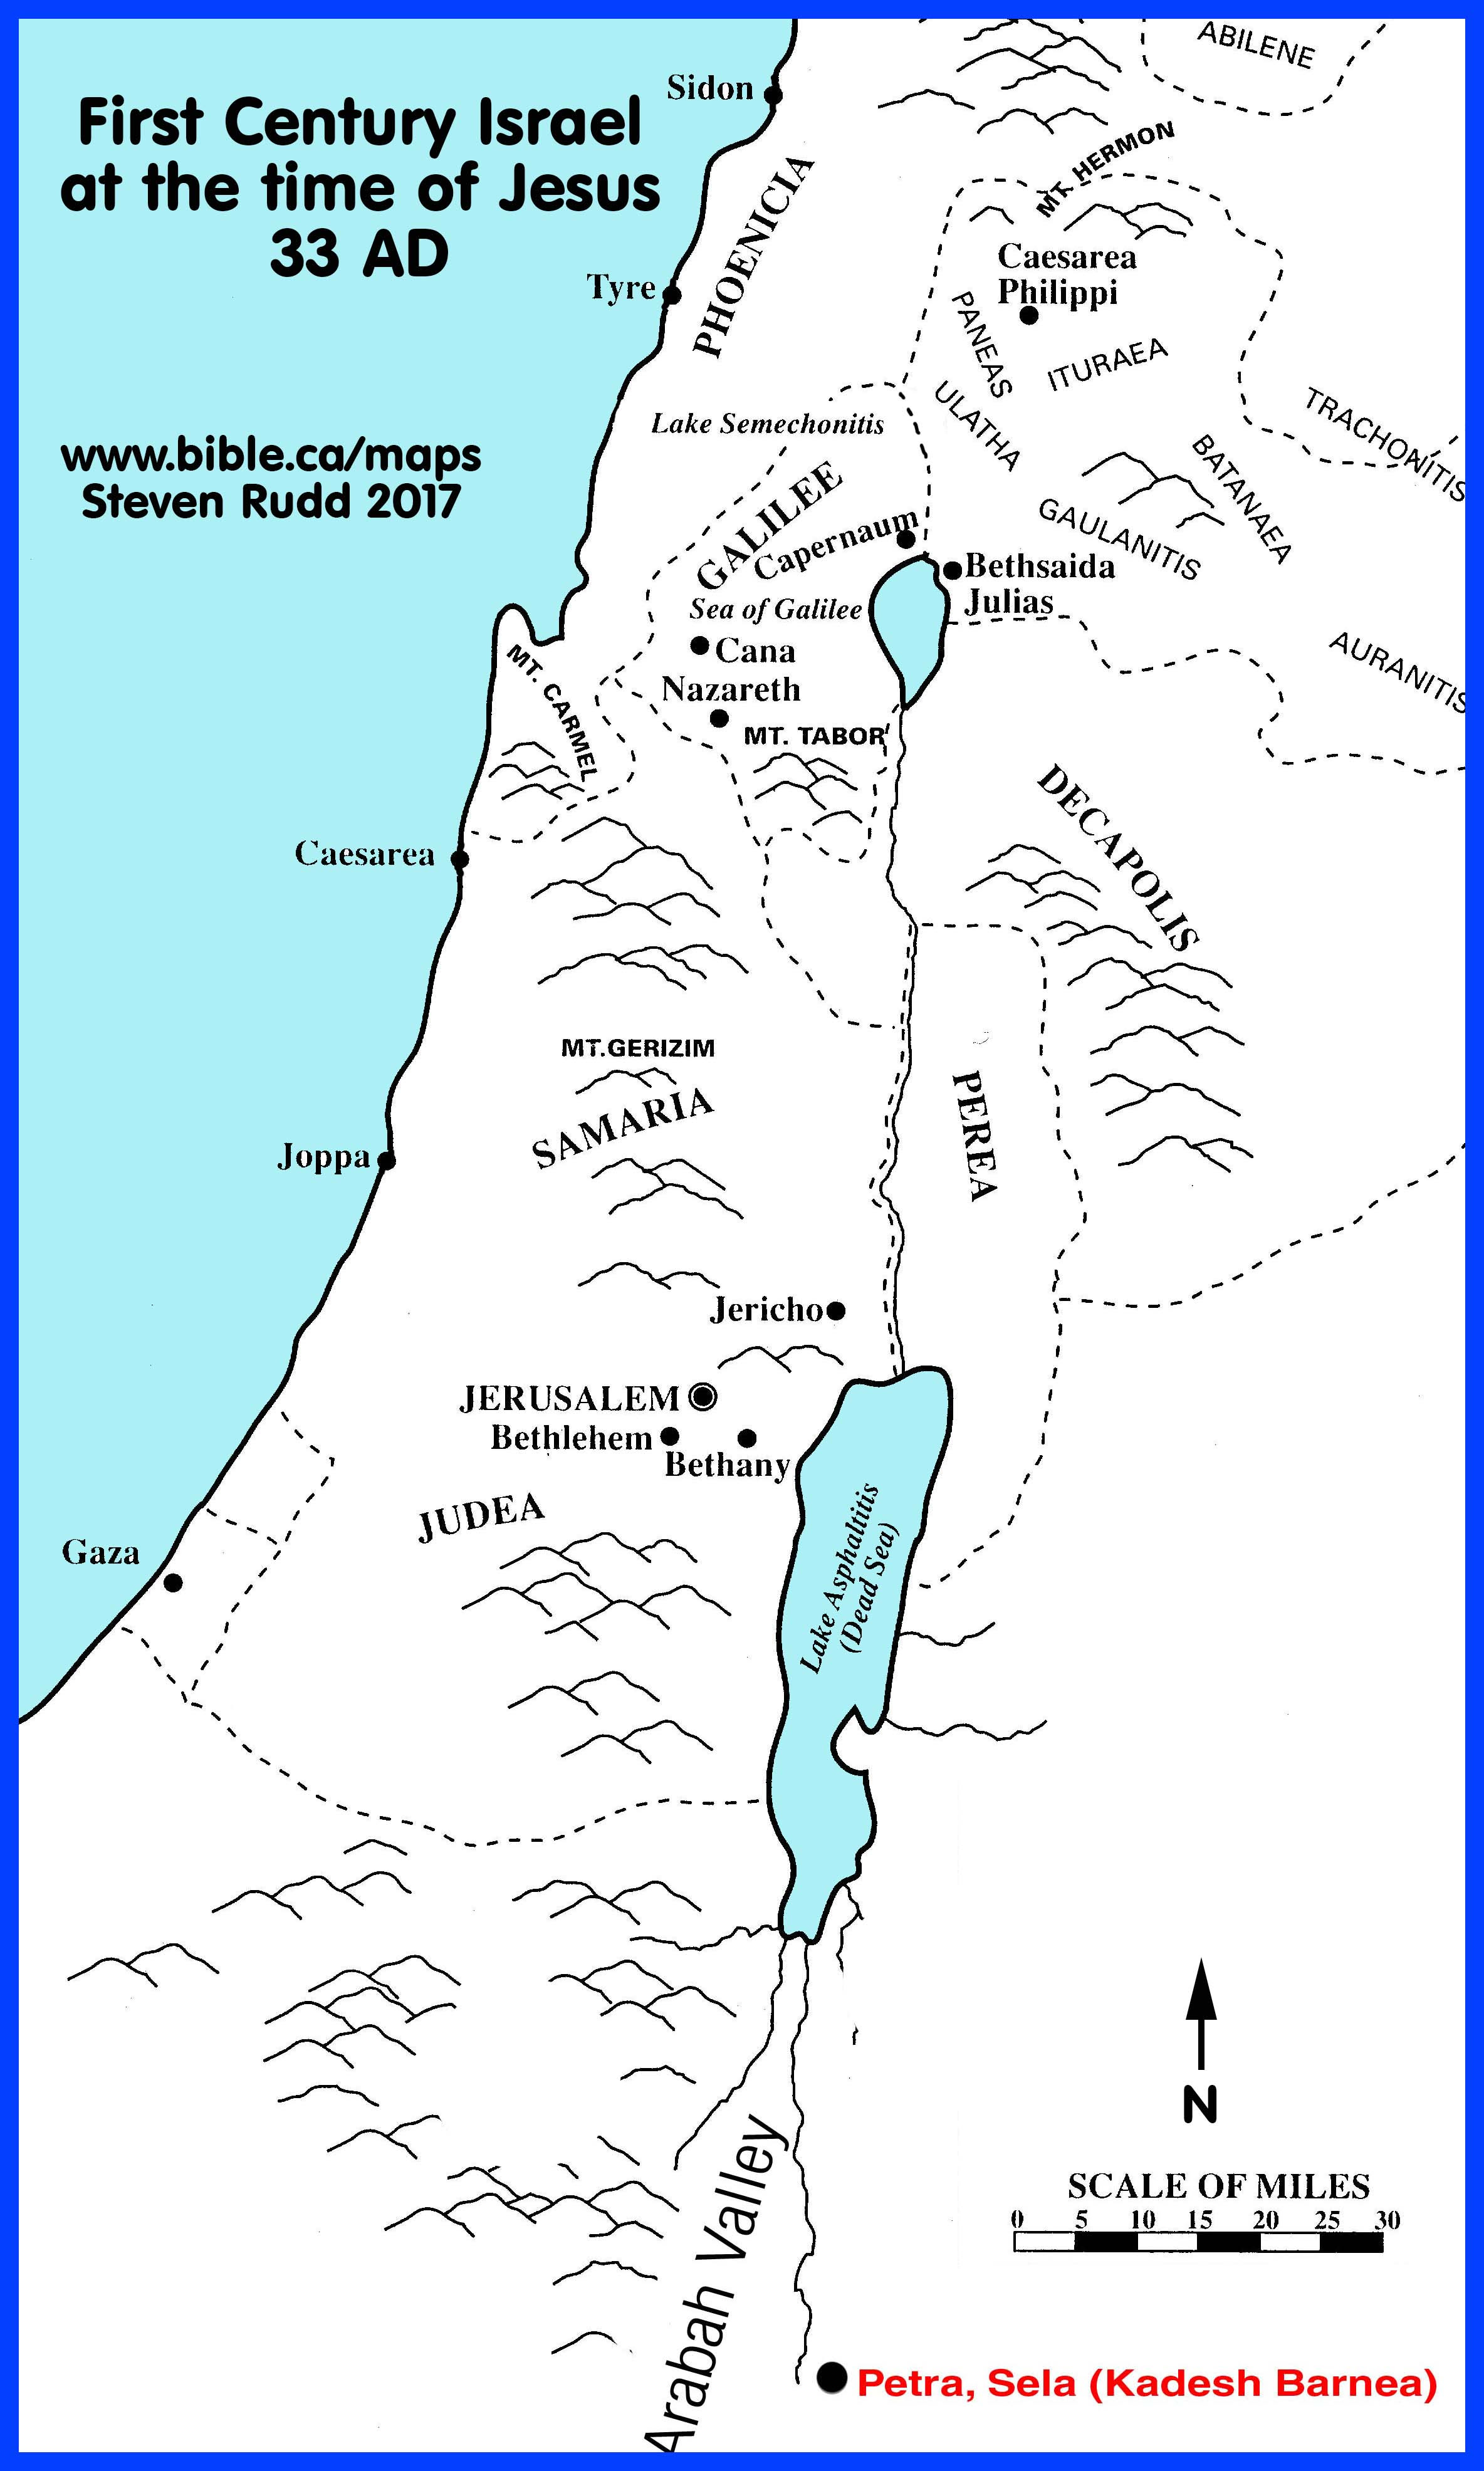 http://www.bible.ca/maps/maps-palestine-33AD.jpg